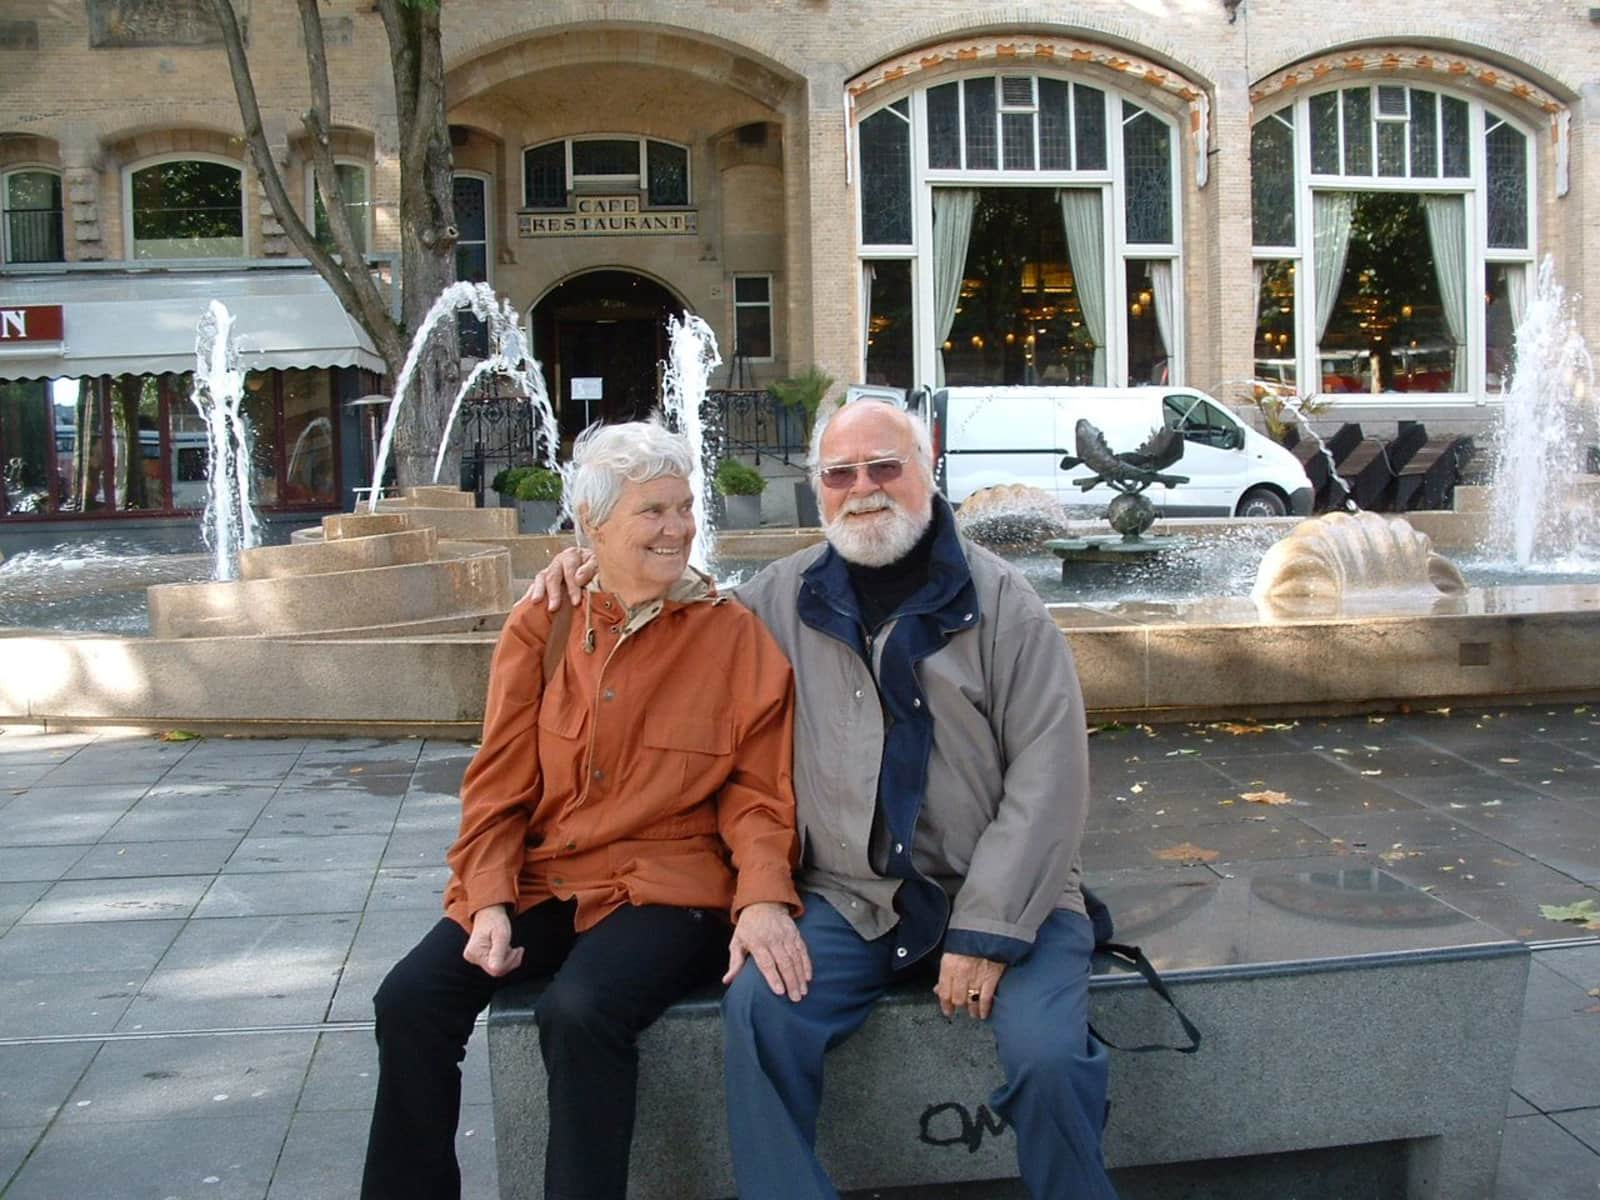 Elly (elizabeth) & Walter from Leopold, Victoria, Australia